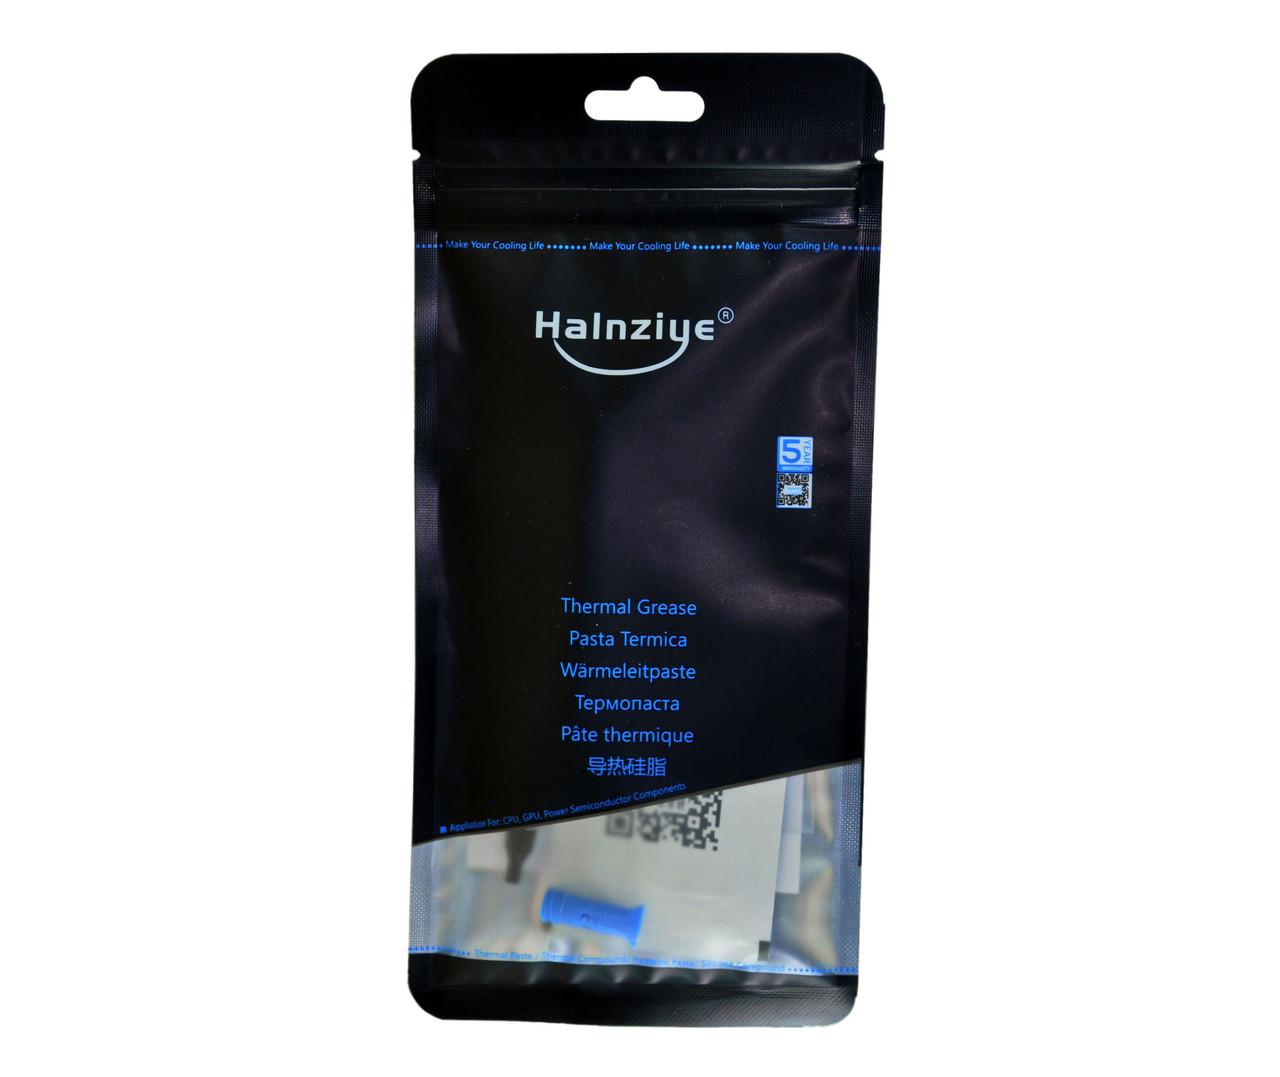 Термопаста Halnziye HY-P11 2г белая 11,8 Вт/м*К теплопроводящая (Tpa-HY-P11-TU2g)